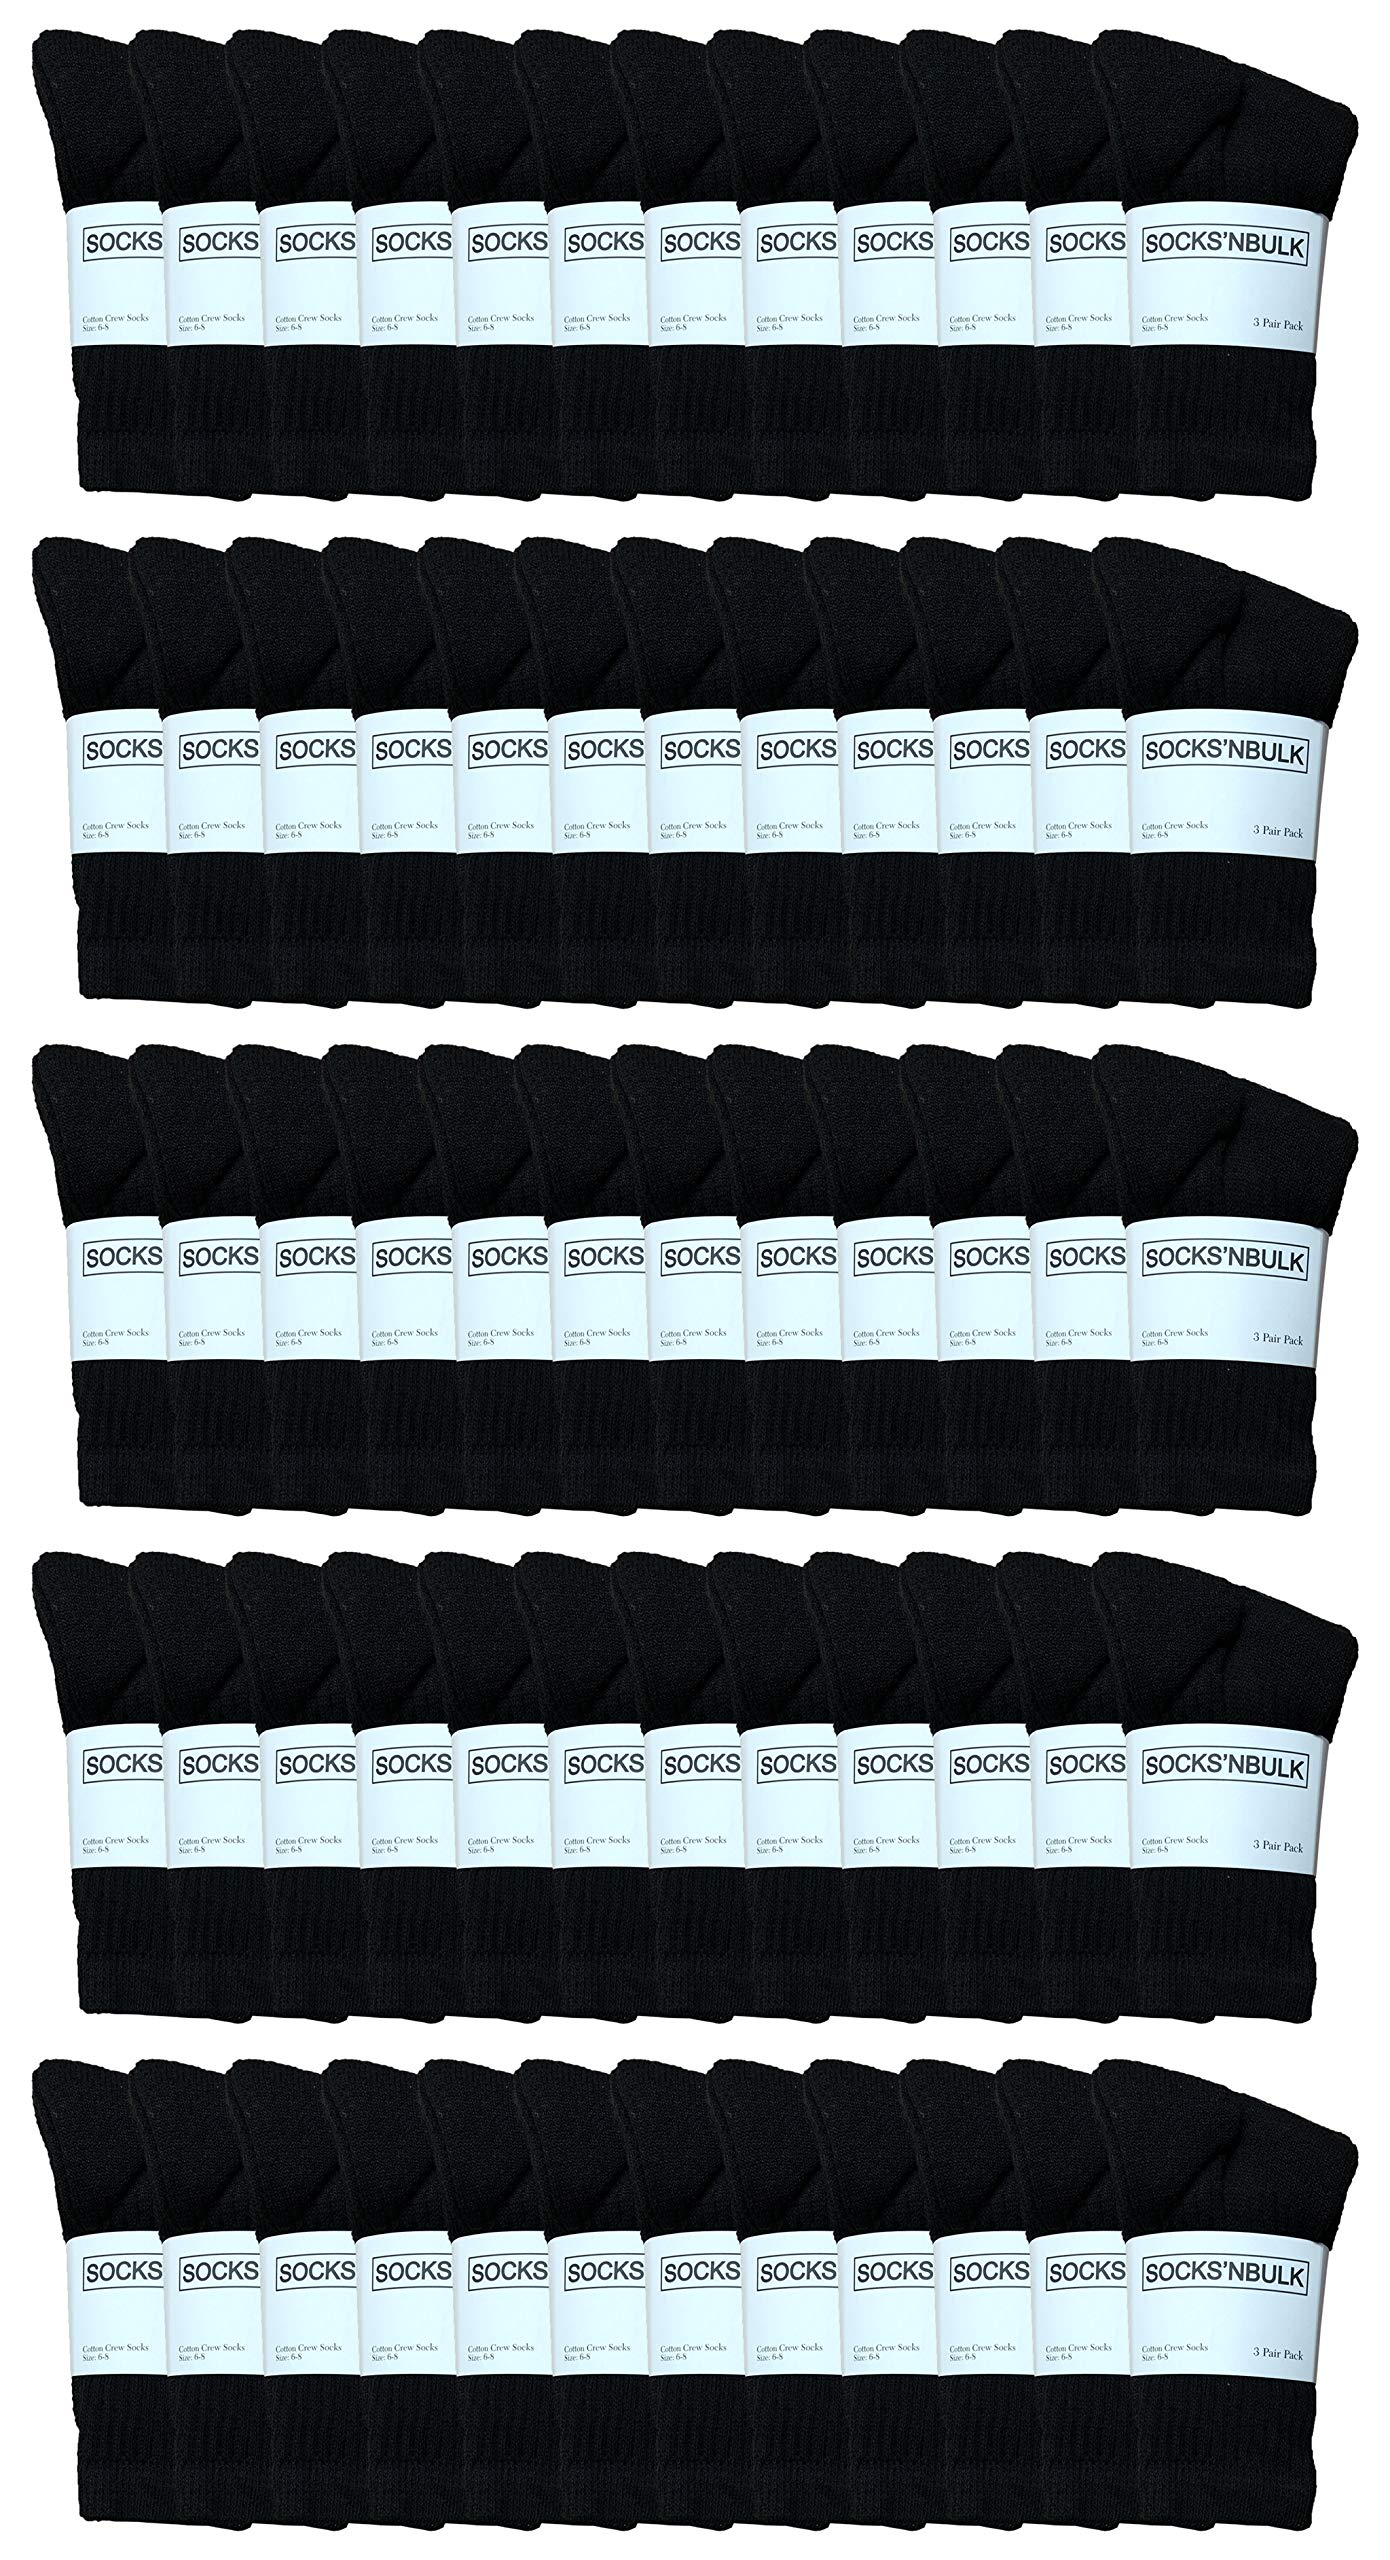 Yacht & Smith 60 Pairs of Kids Sports Crew Socks, Wholesale Bulk Pack Sock by SOCKS'NBULK (Black)